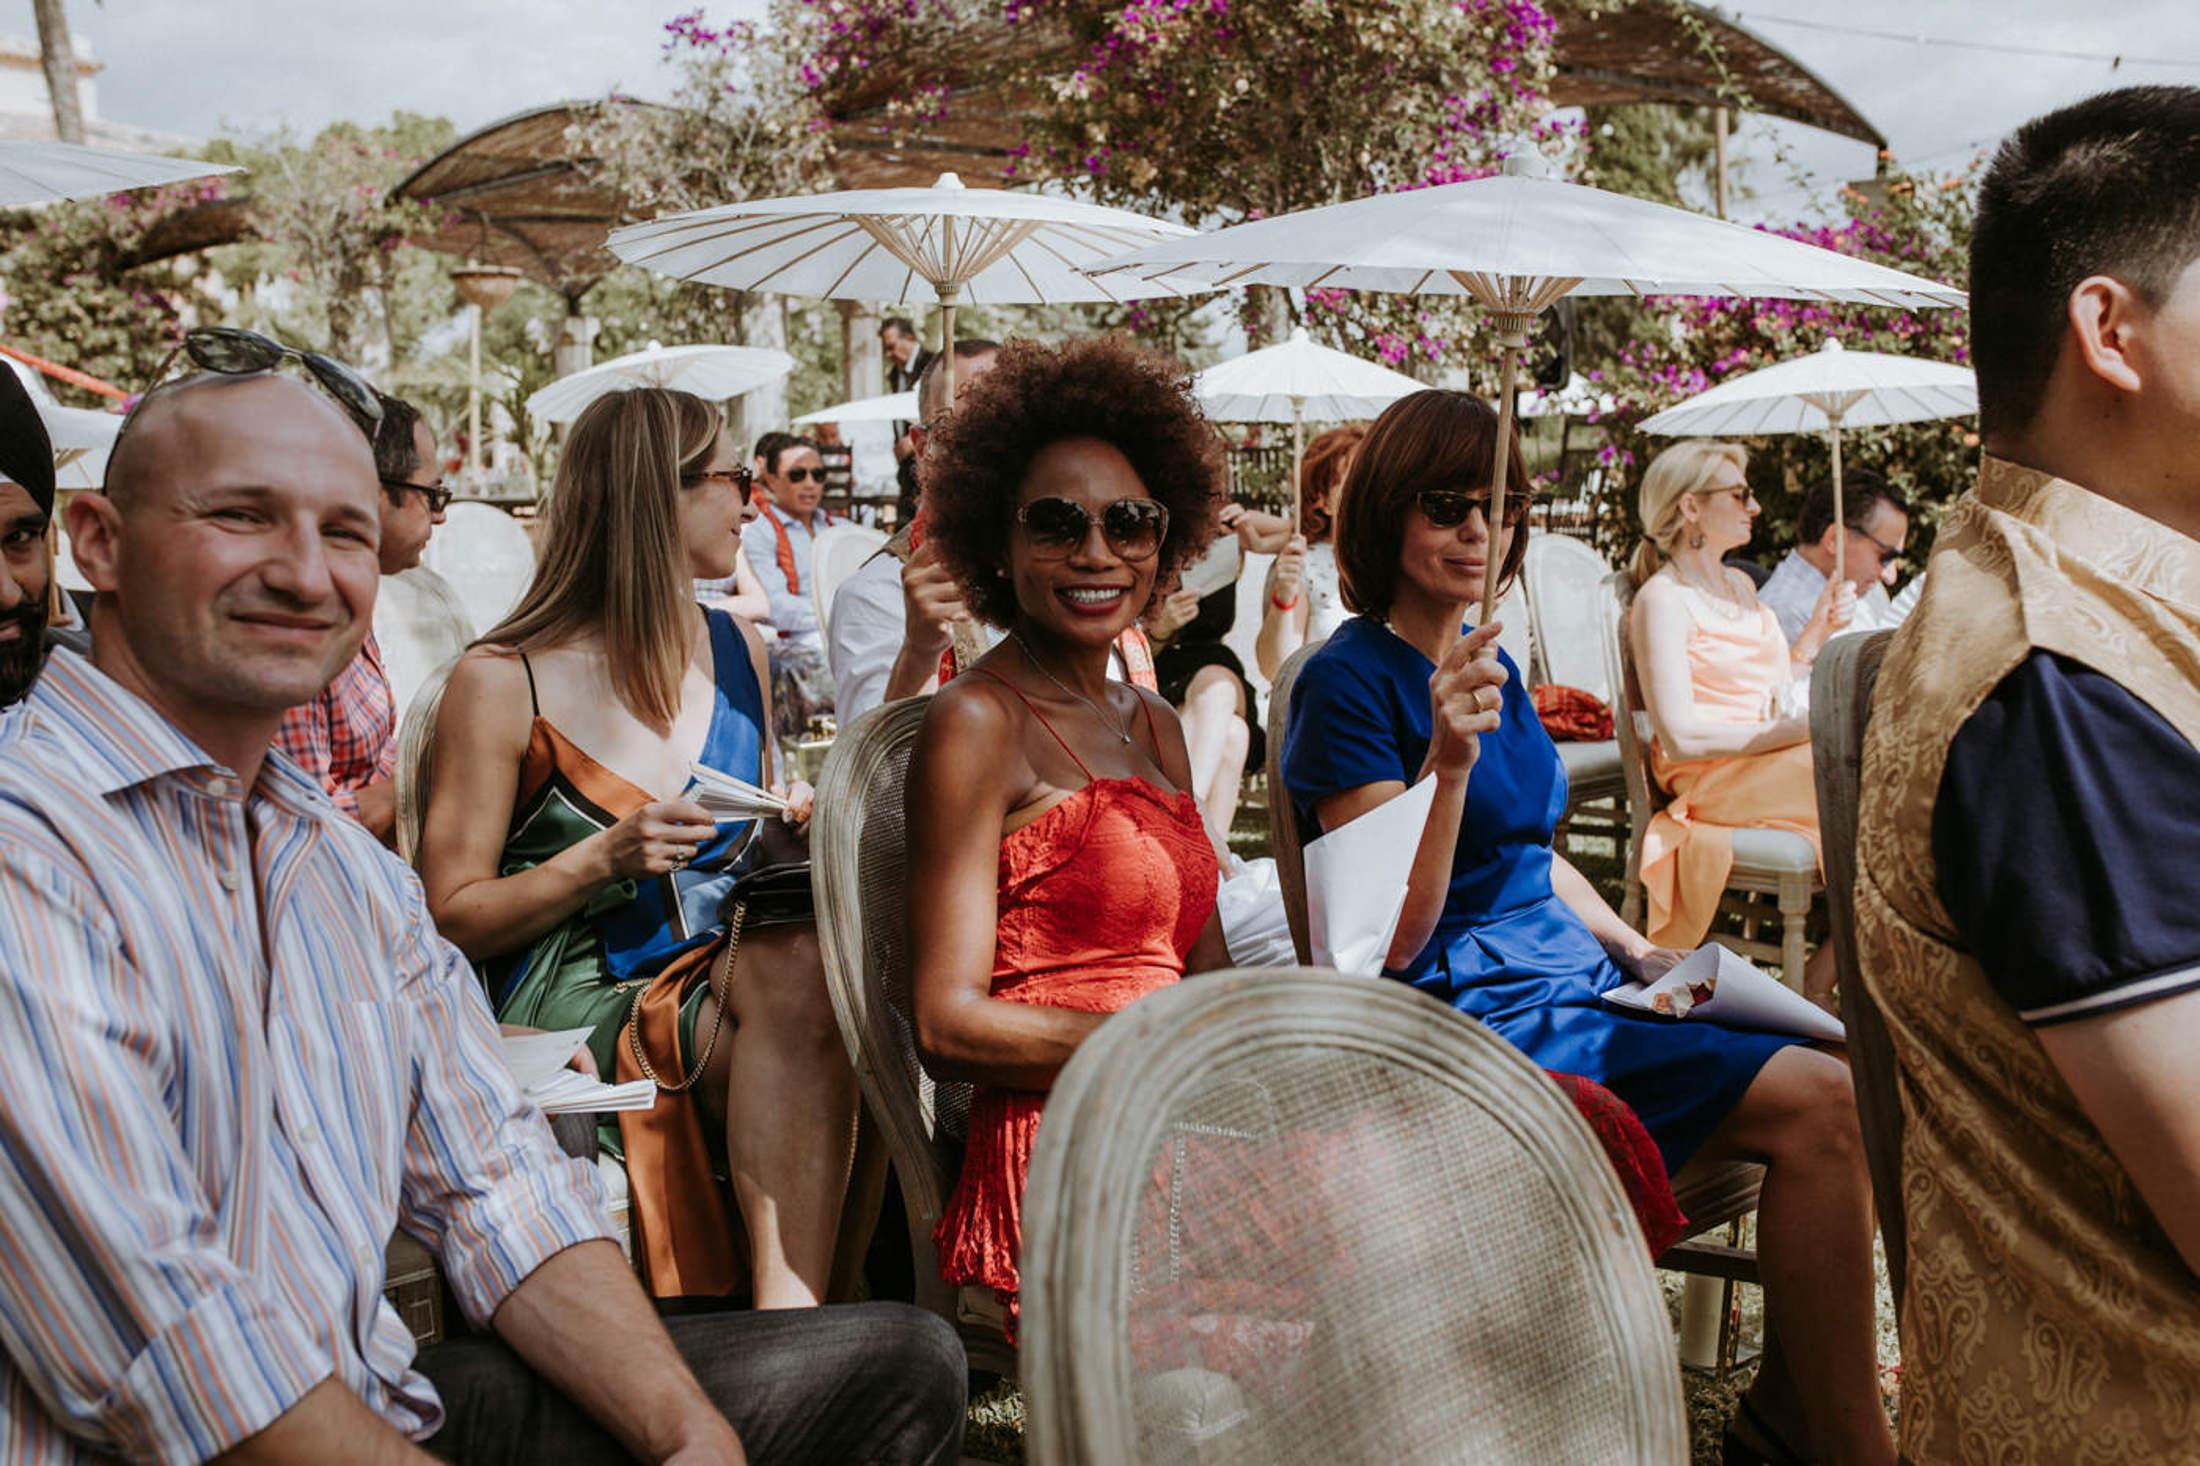 Wedding_Photographer_Mallorca_Daniela-Marquardt_Photography_New_York_Iceland_Tuscany_Santorini_Portugal_Austria_Bavaria_Elopement_Hochzeitsfotograf_AntjeRajat2_41